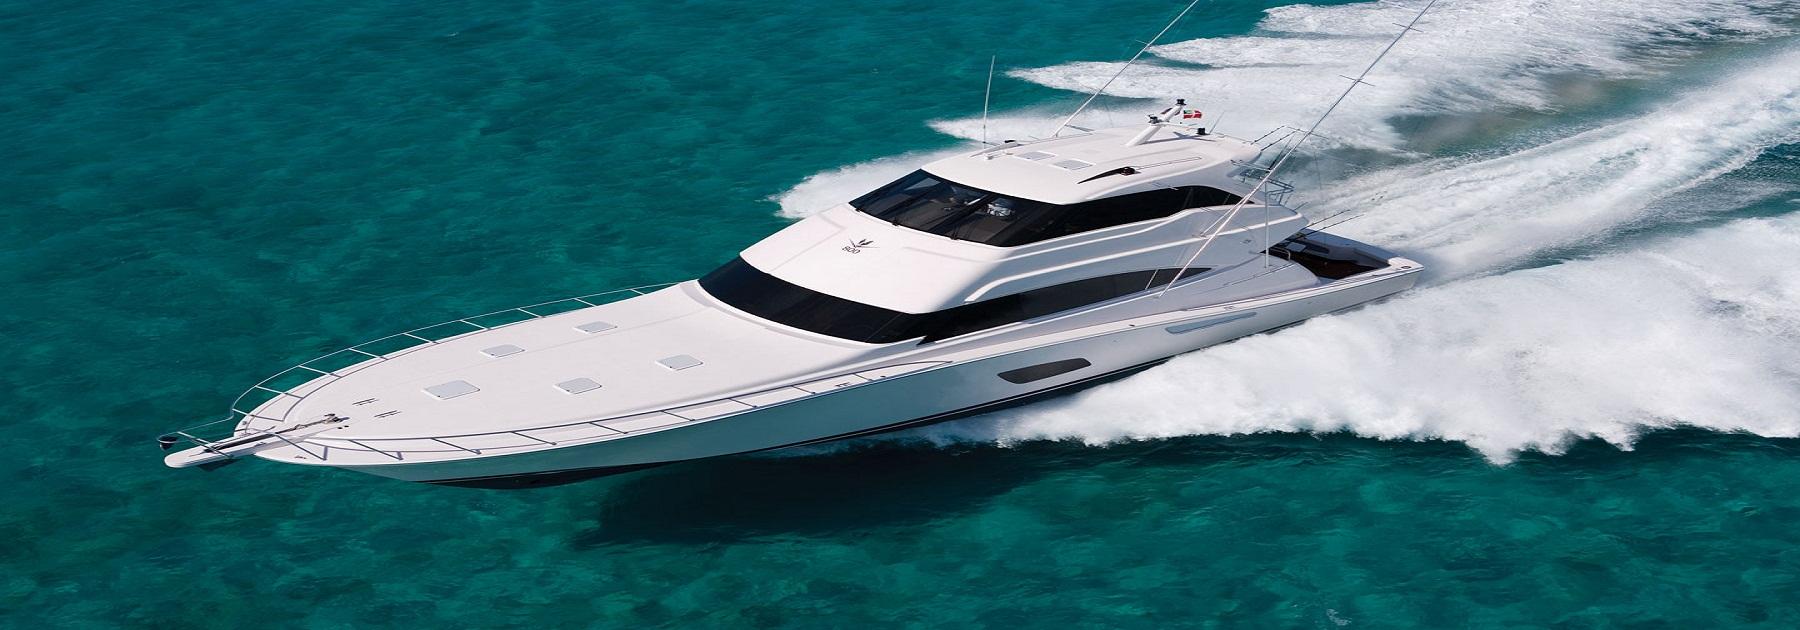 Bertram Yachts And Boats For Sale Miami Bertram Dealers